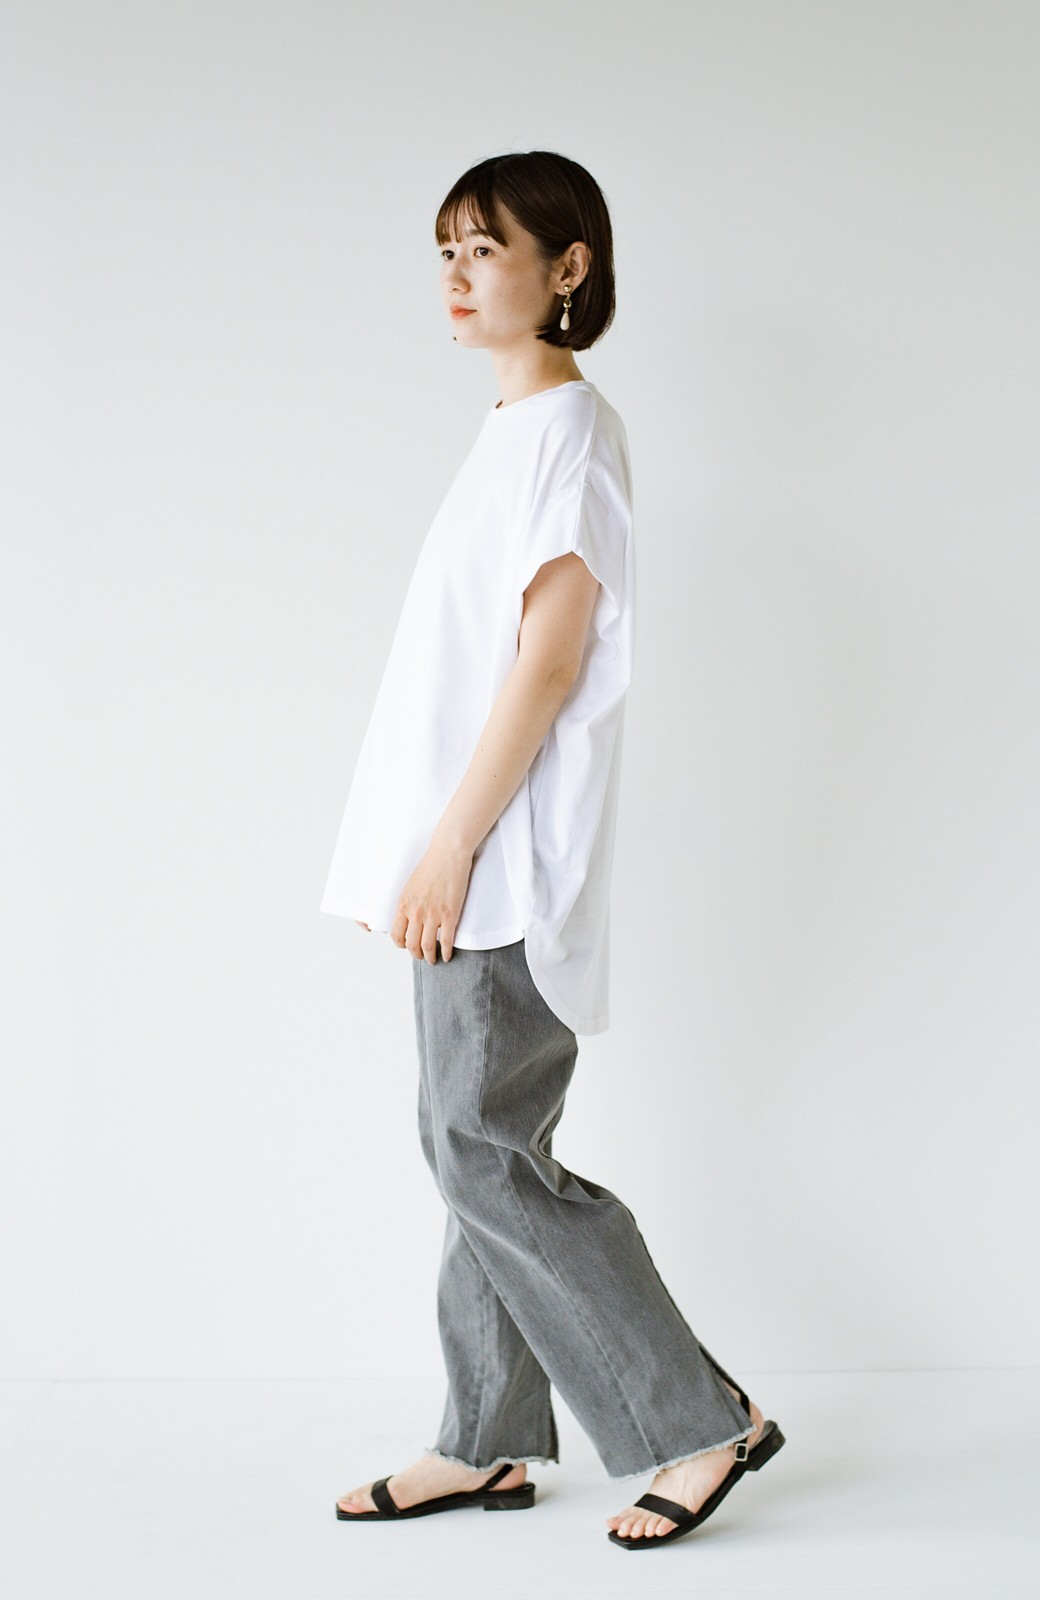 haco! PBPオーガニックコットン 楽ちんなのにブラウス気分で着られる大人のおめかしTシャツ <ホワイト>の商品写真18